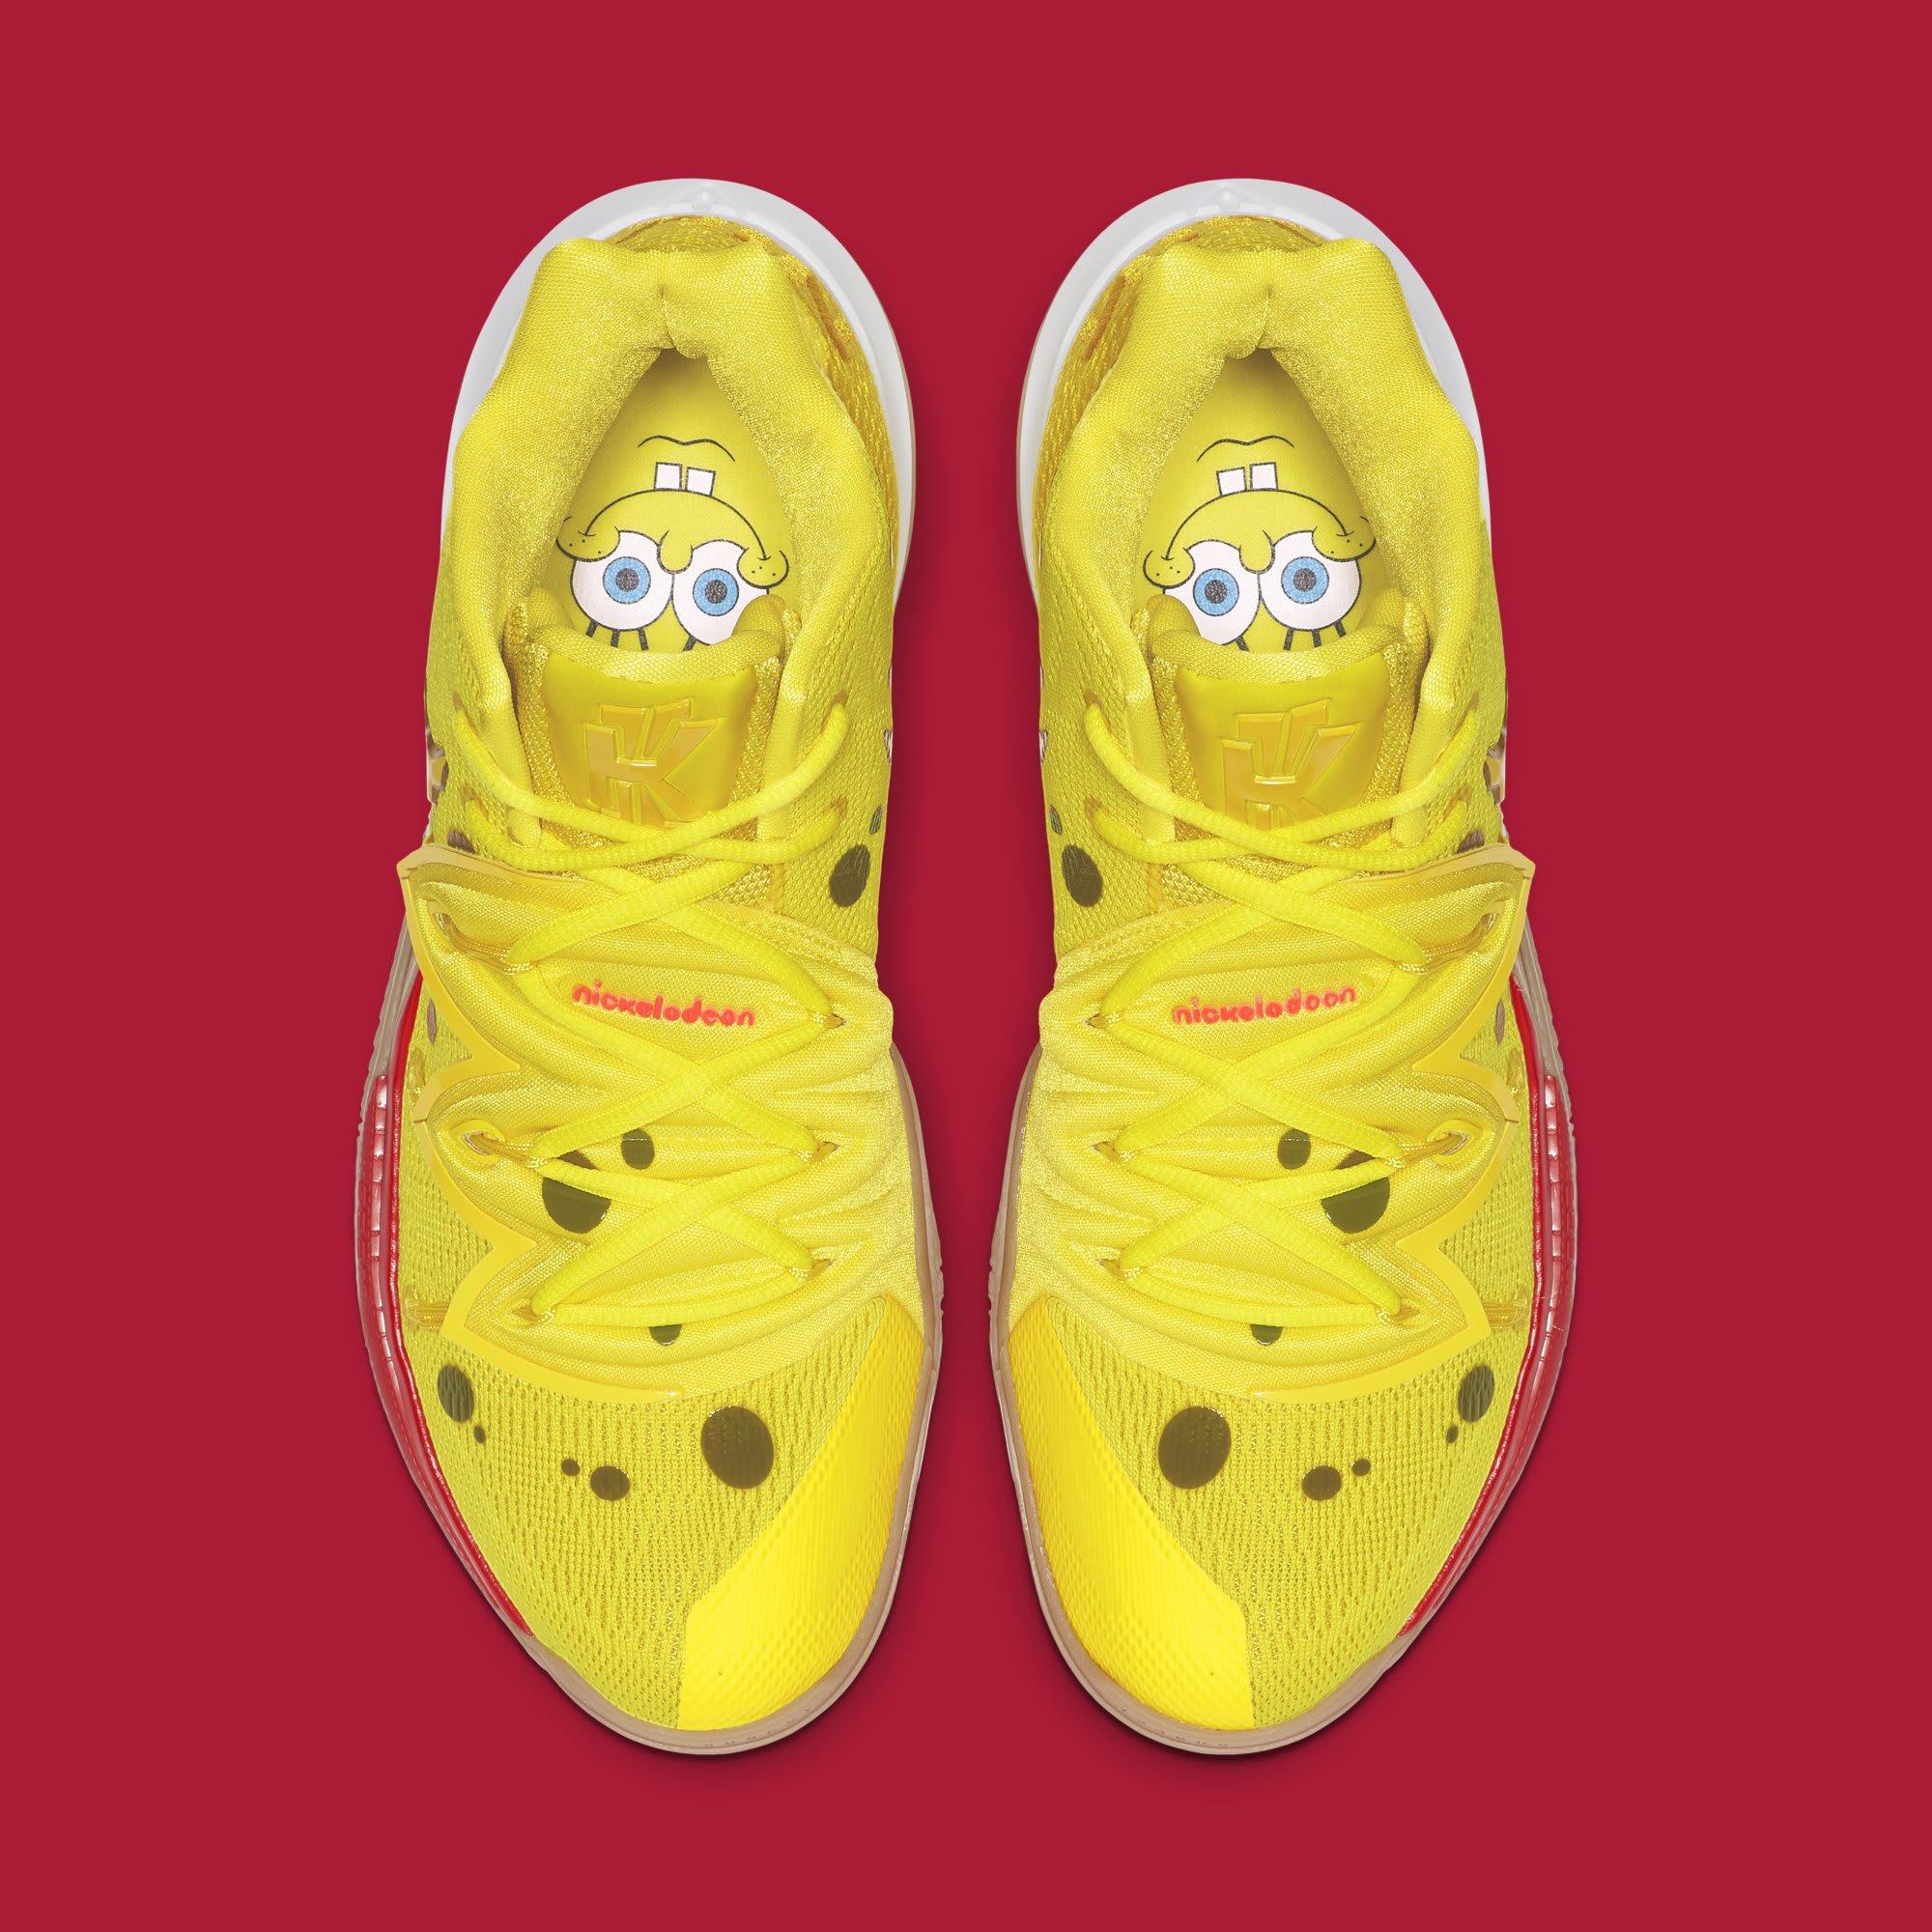 'SpongeBob SquarePants' x Nike Kyrie 5 'SpongeBob' CJ6951-700 (Top)